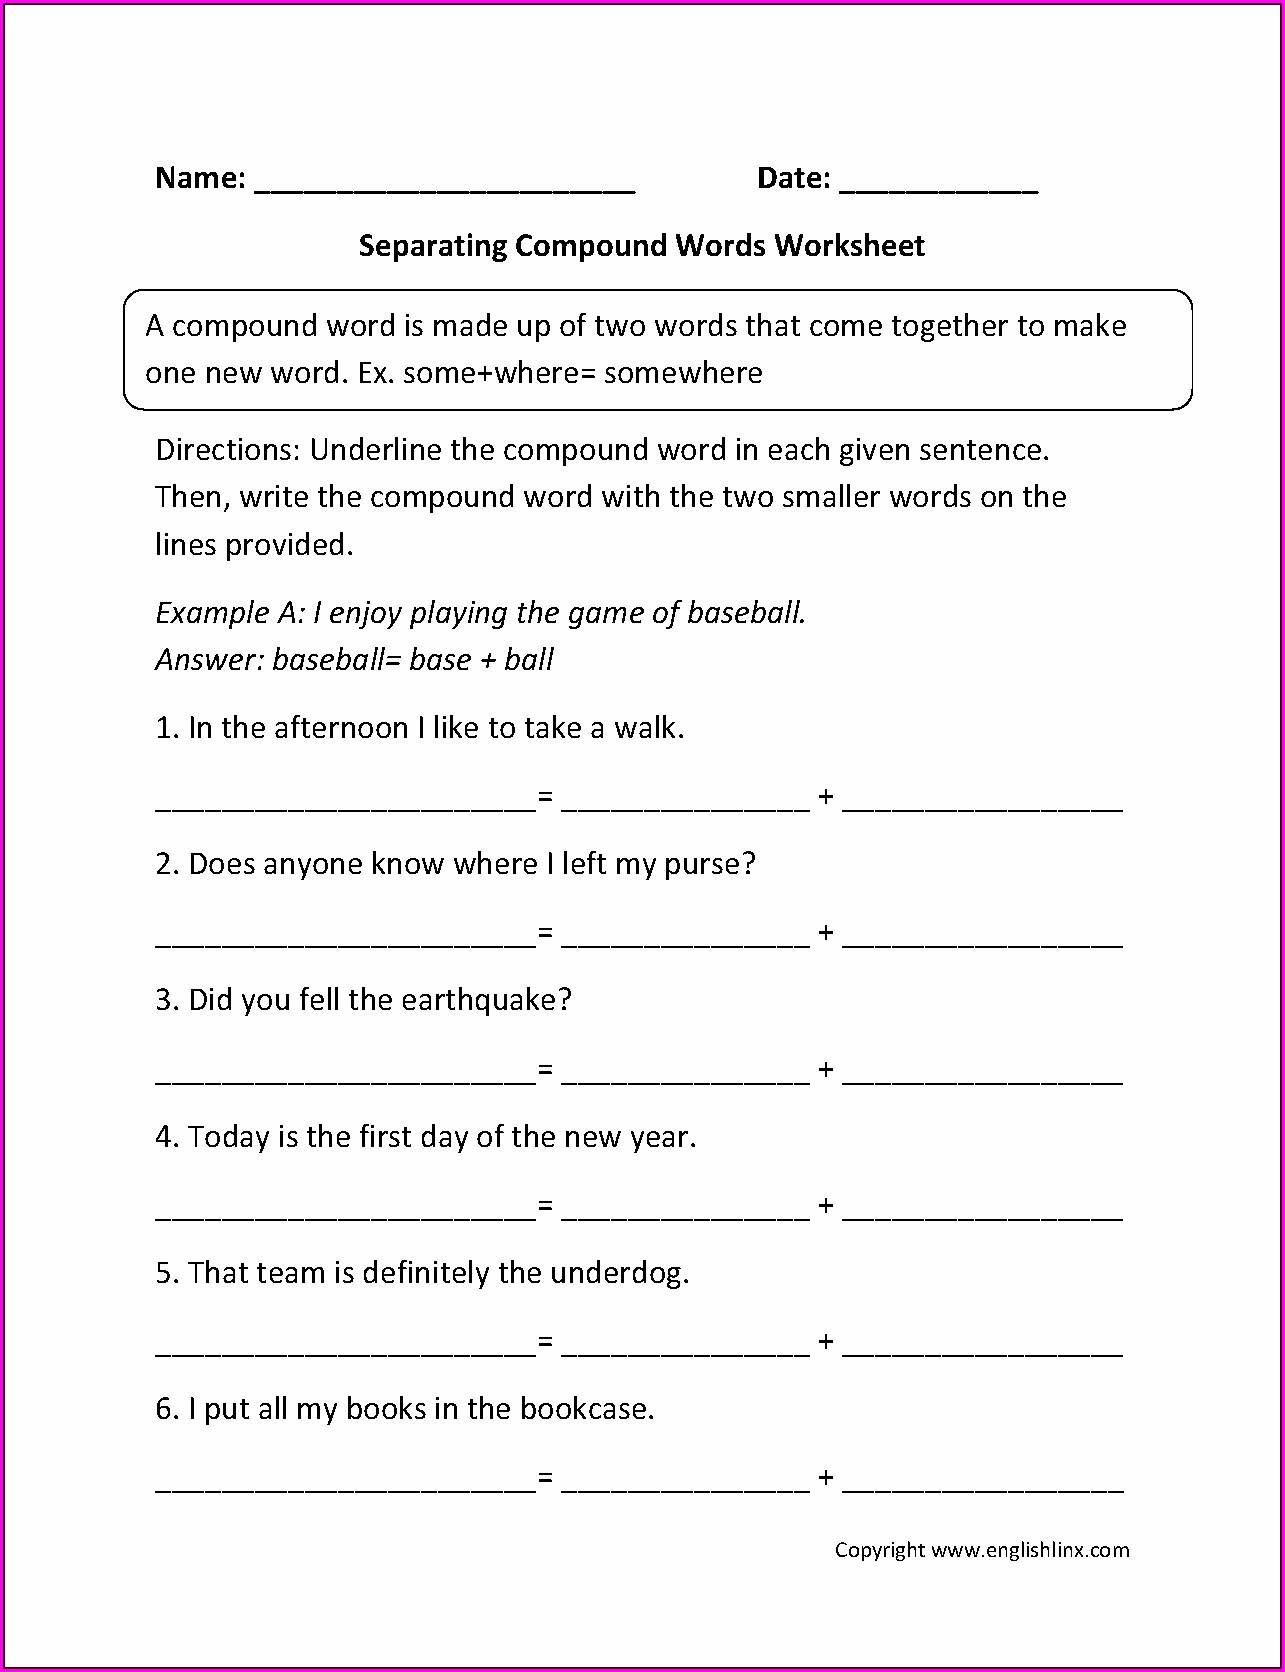 Compound Words Worksheet For Second Grade